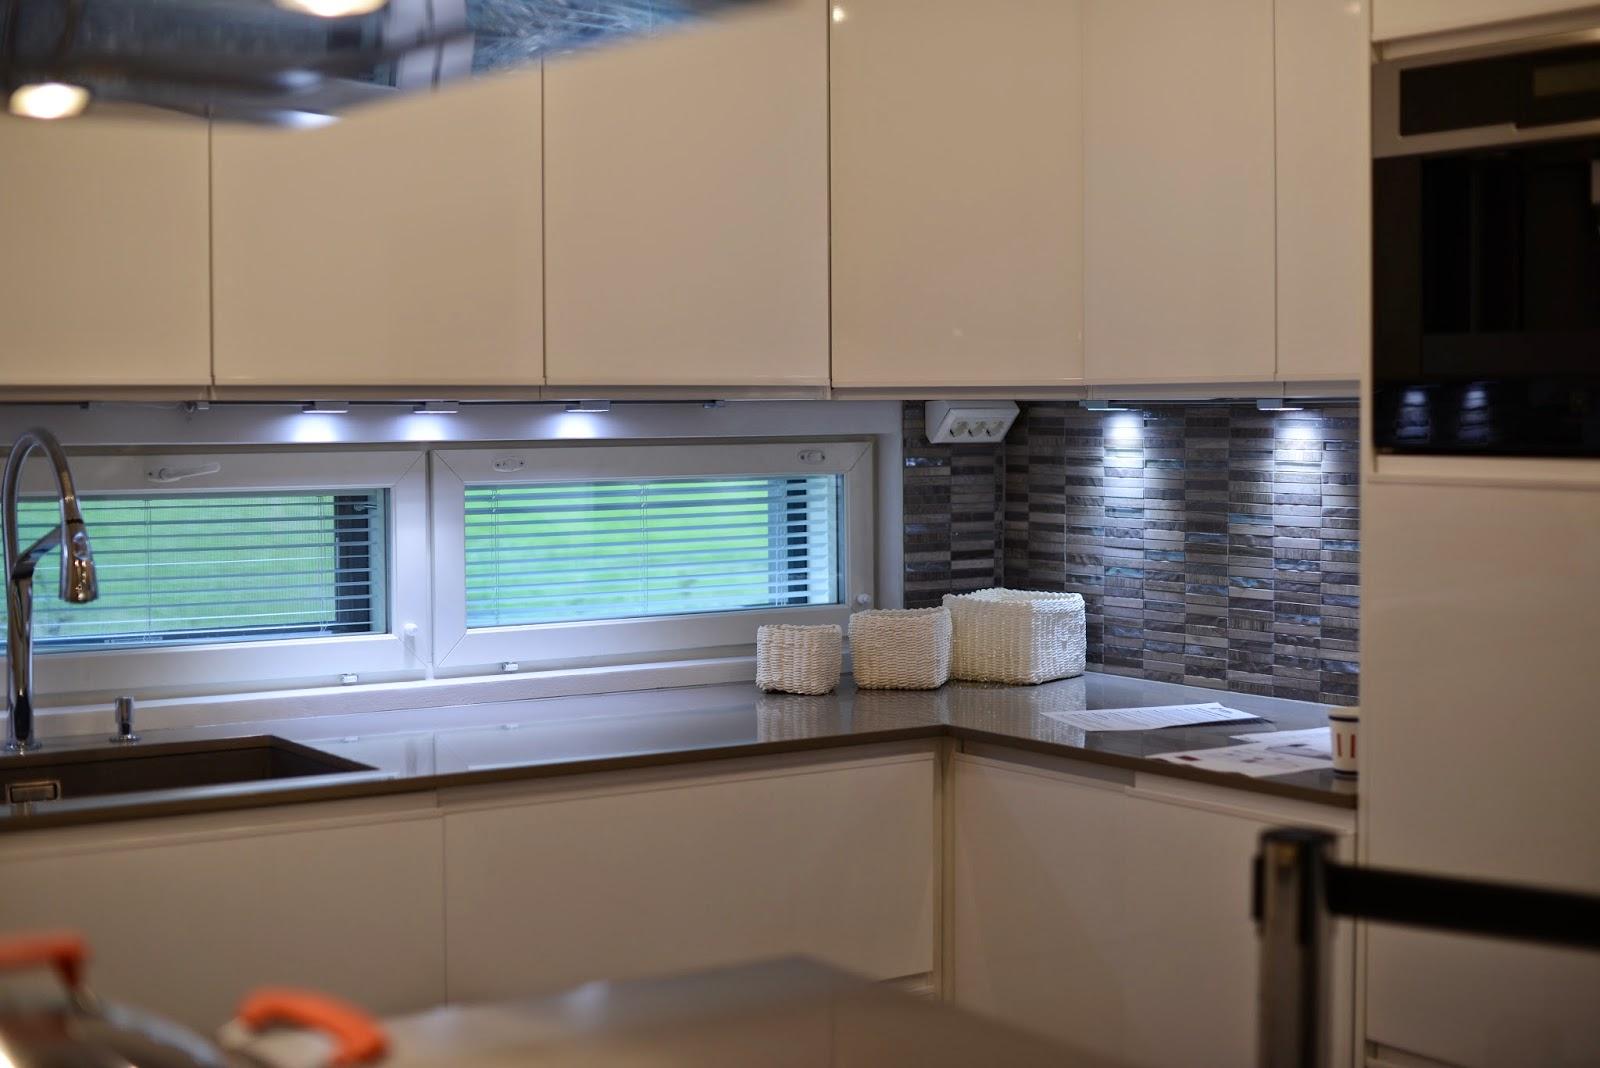 Rouva Y Asuntomessut 2014; Keittiöajatuksia